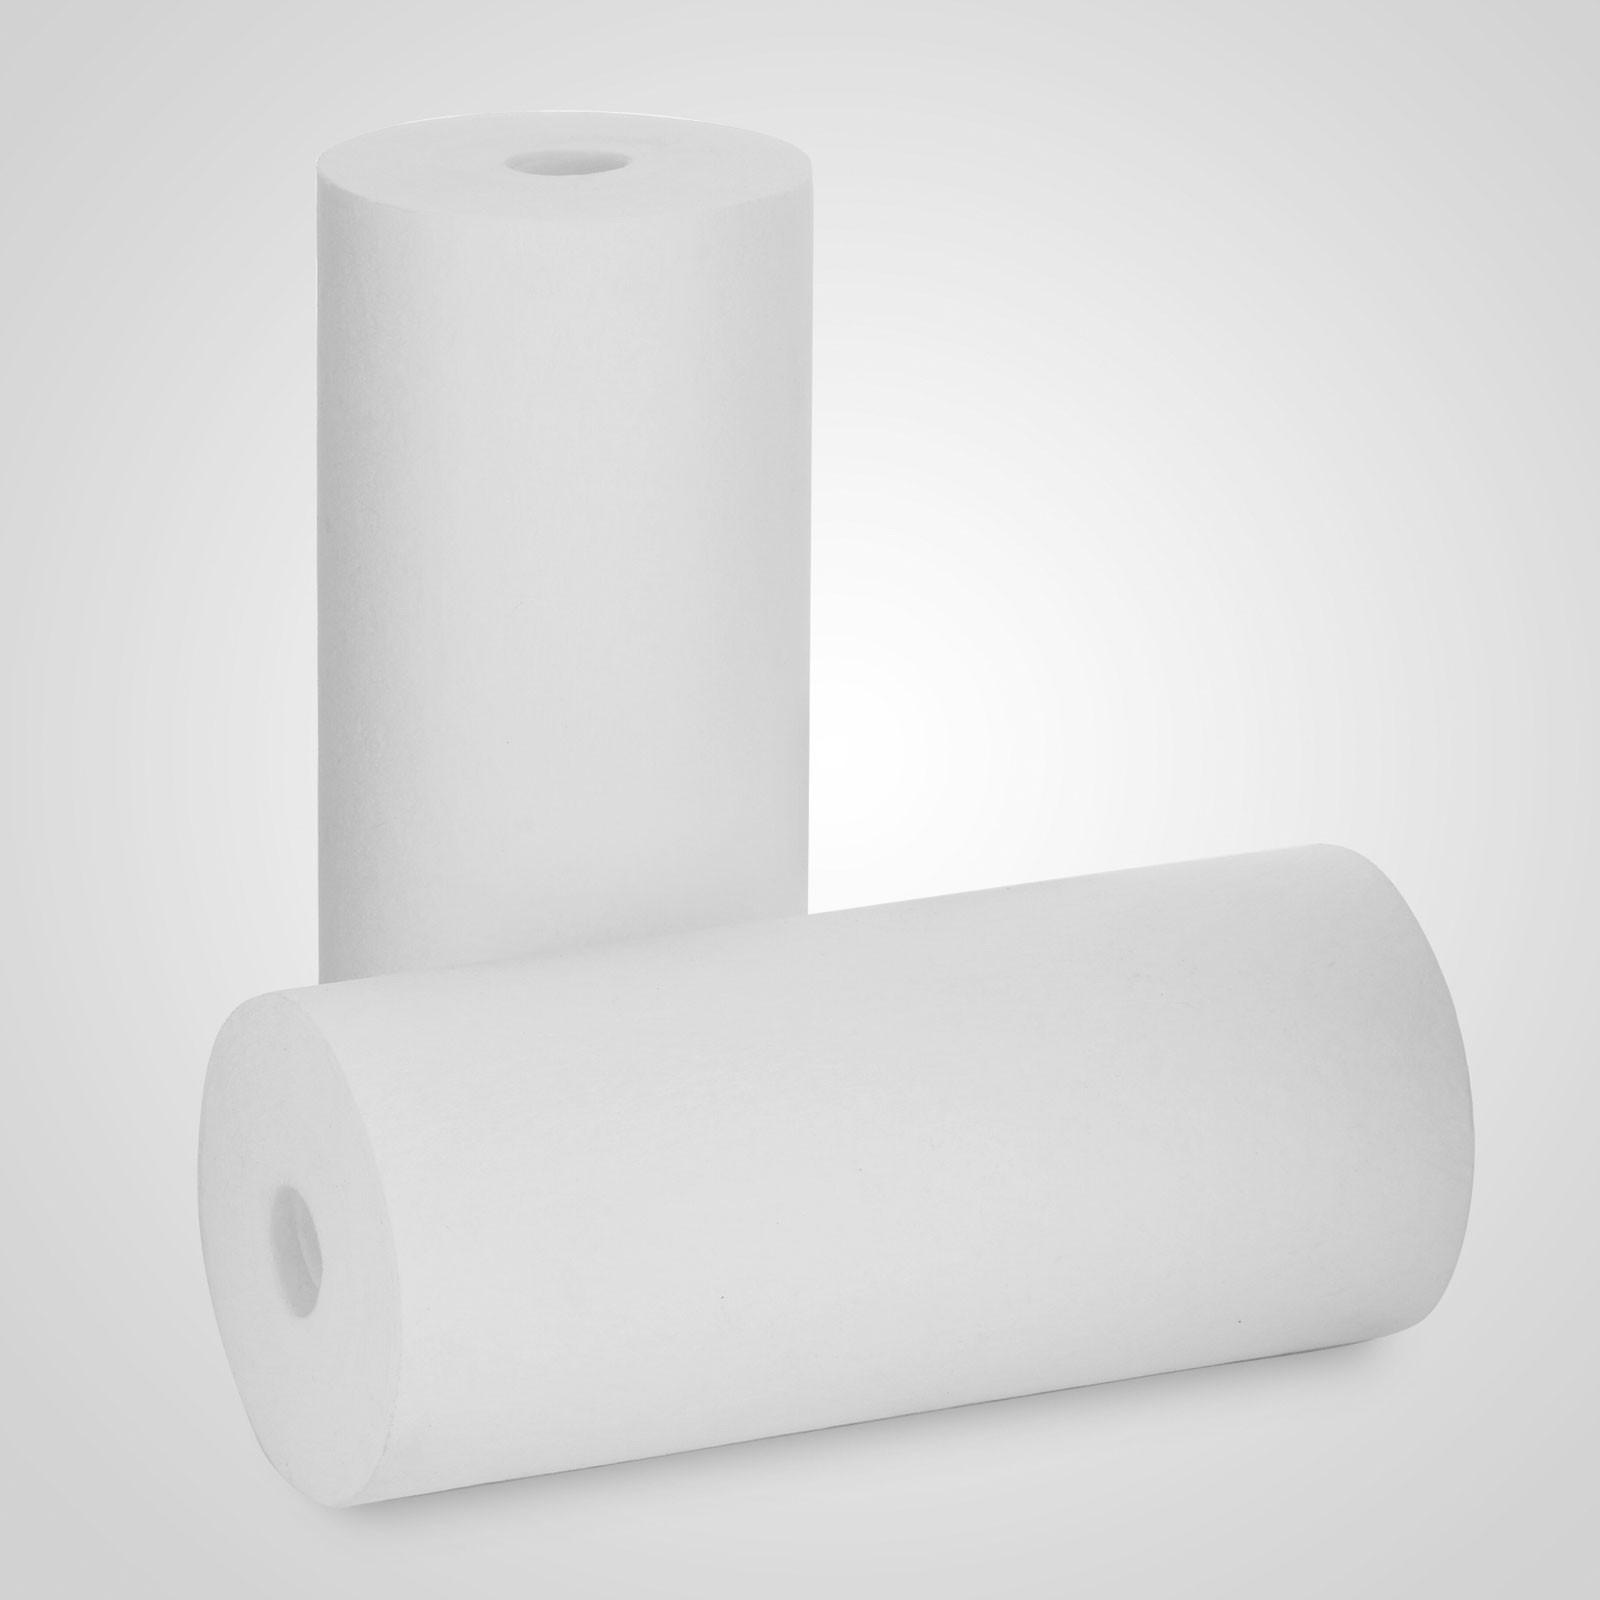 20Pcs-Cartouche-Filtrante-5-Micron-10-034-X-4-5-034-as-Brita-Emballe-Individu-Bobine miniature 9